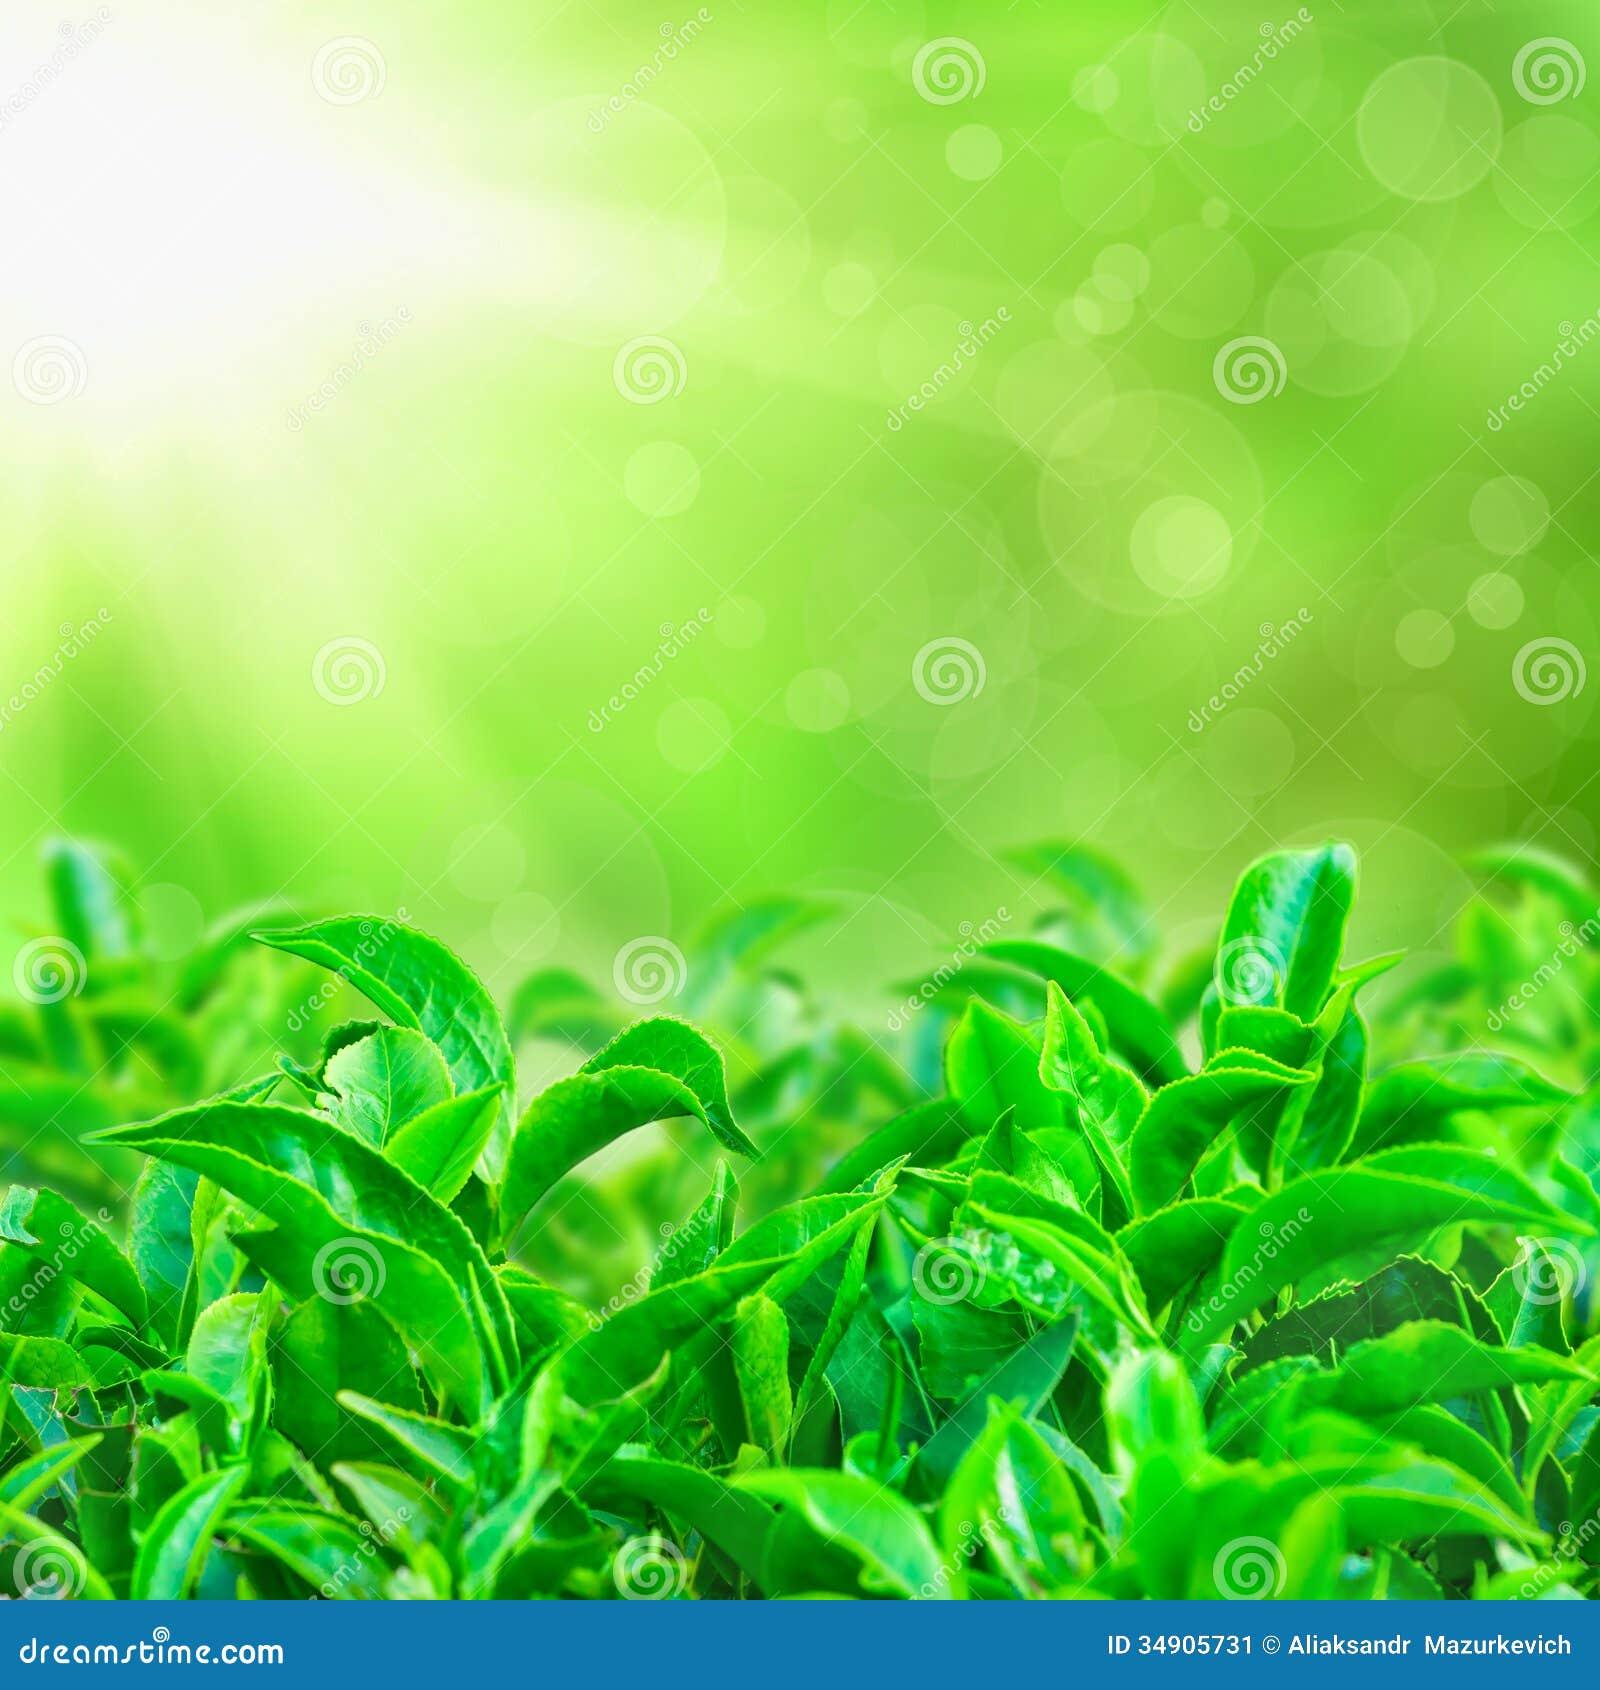 Fresh green tea leaves with sun beams